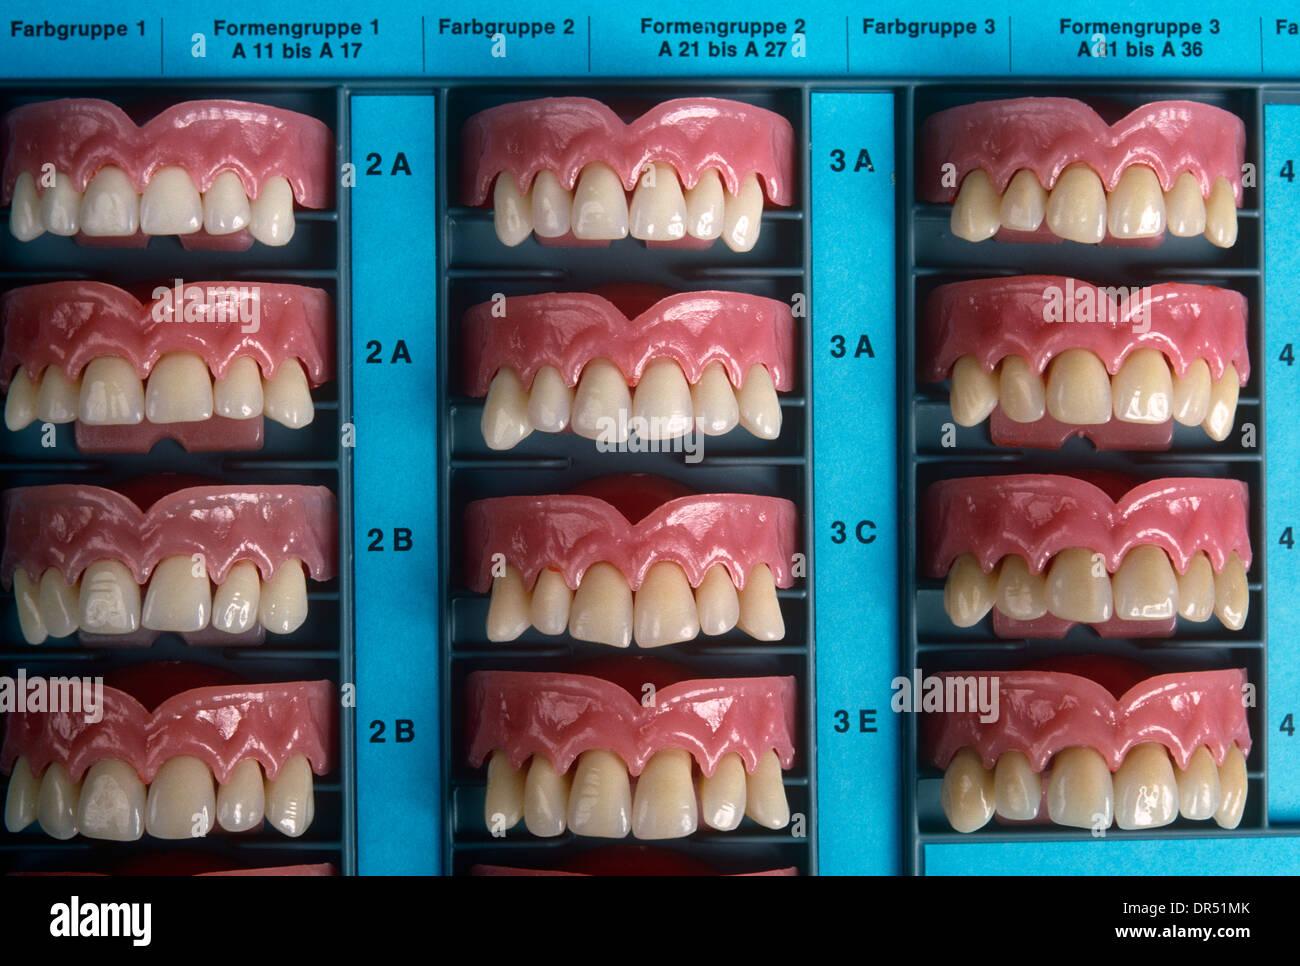 acrylic-teeth-samples-displayed-at-ivocl